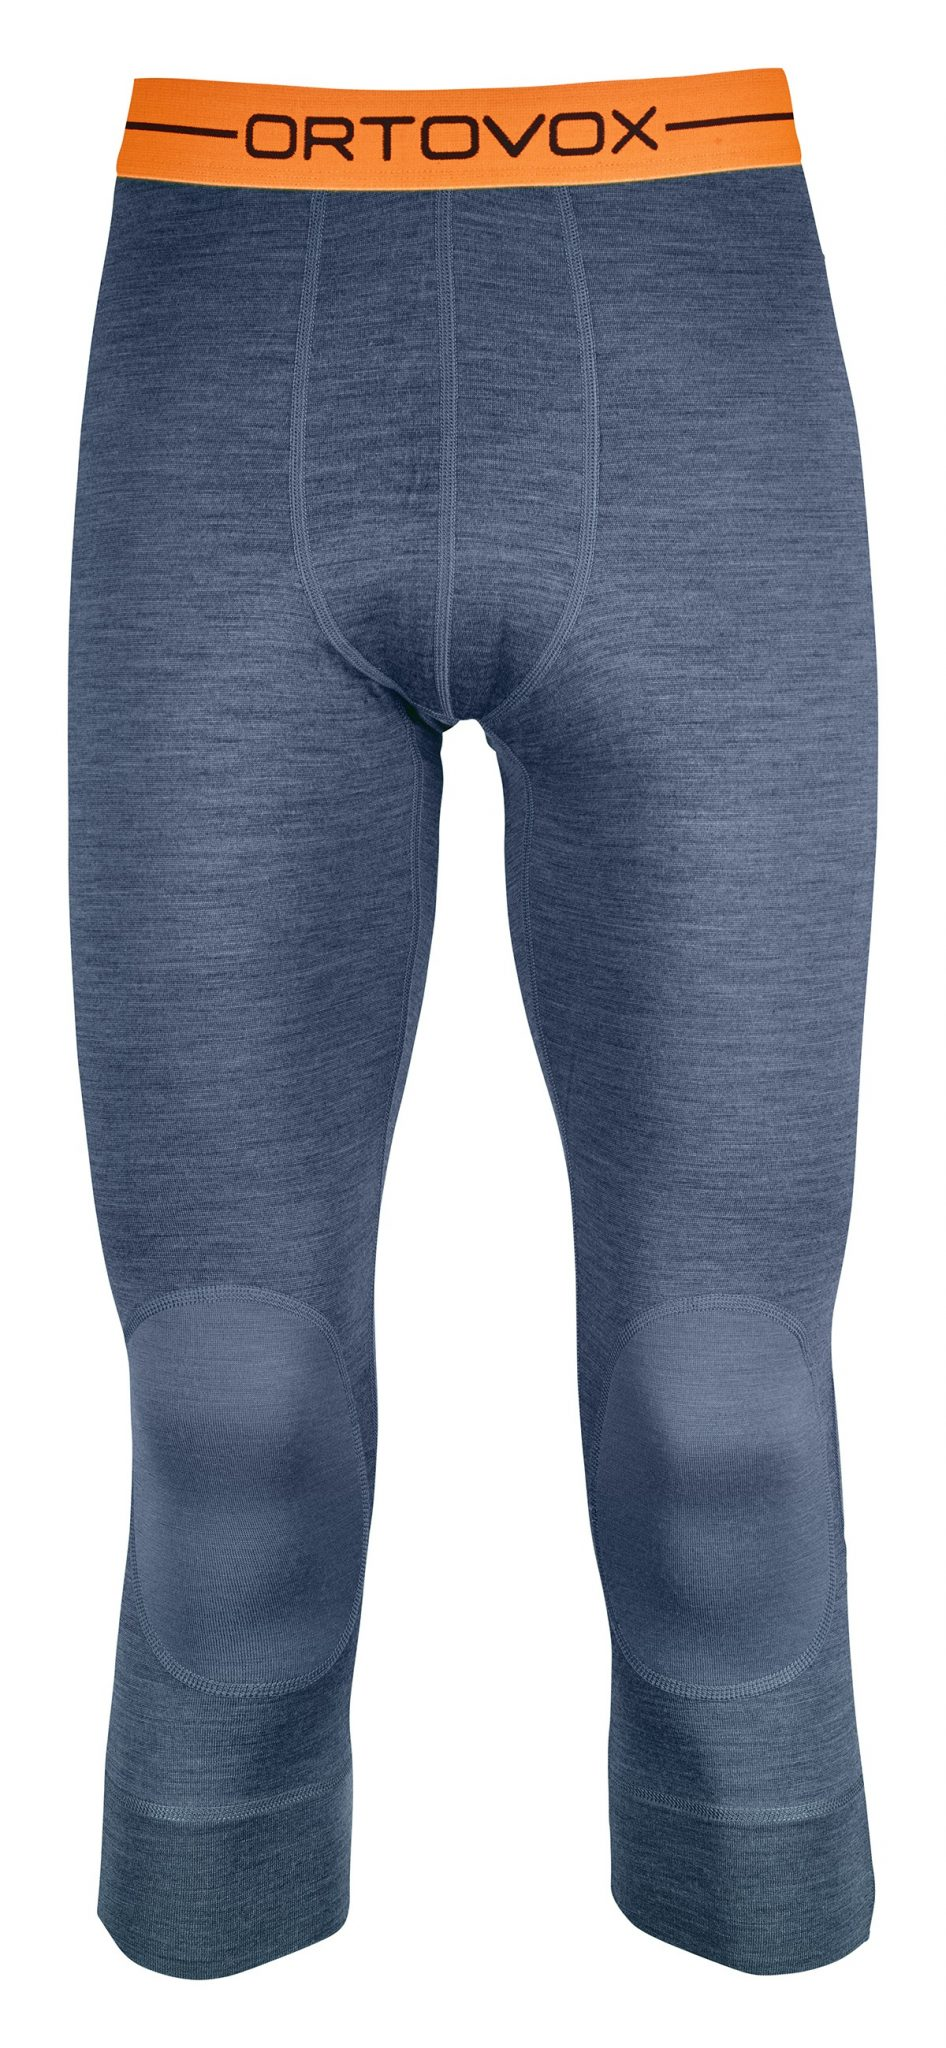 Ortovox Merino Rock n Wool Short Pants - Night Blue Blend